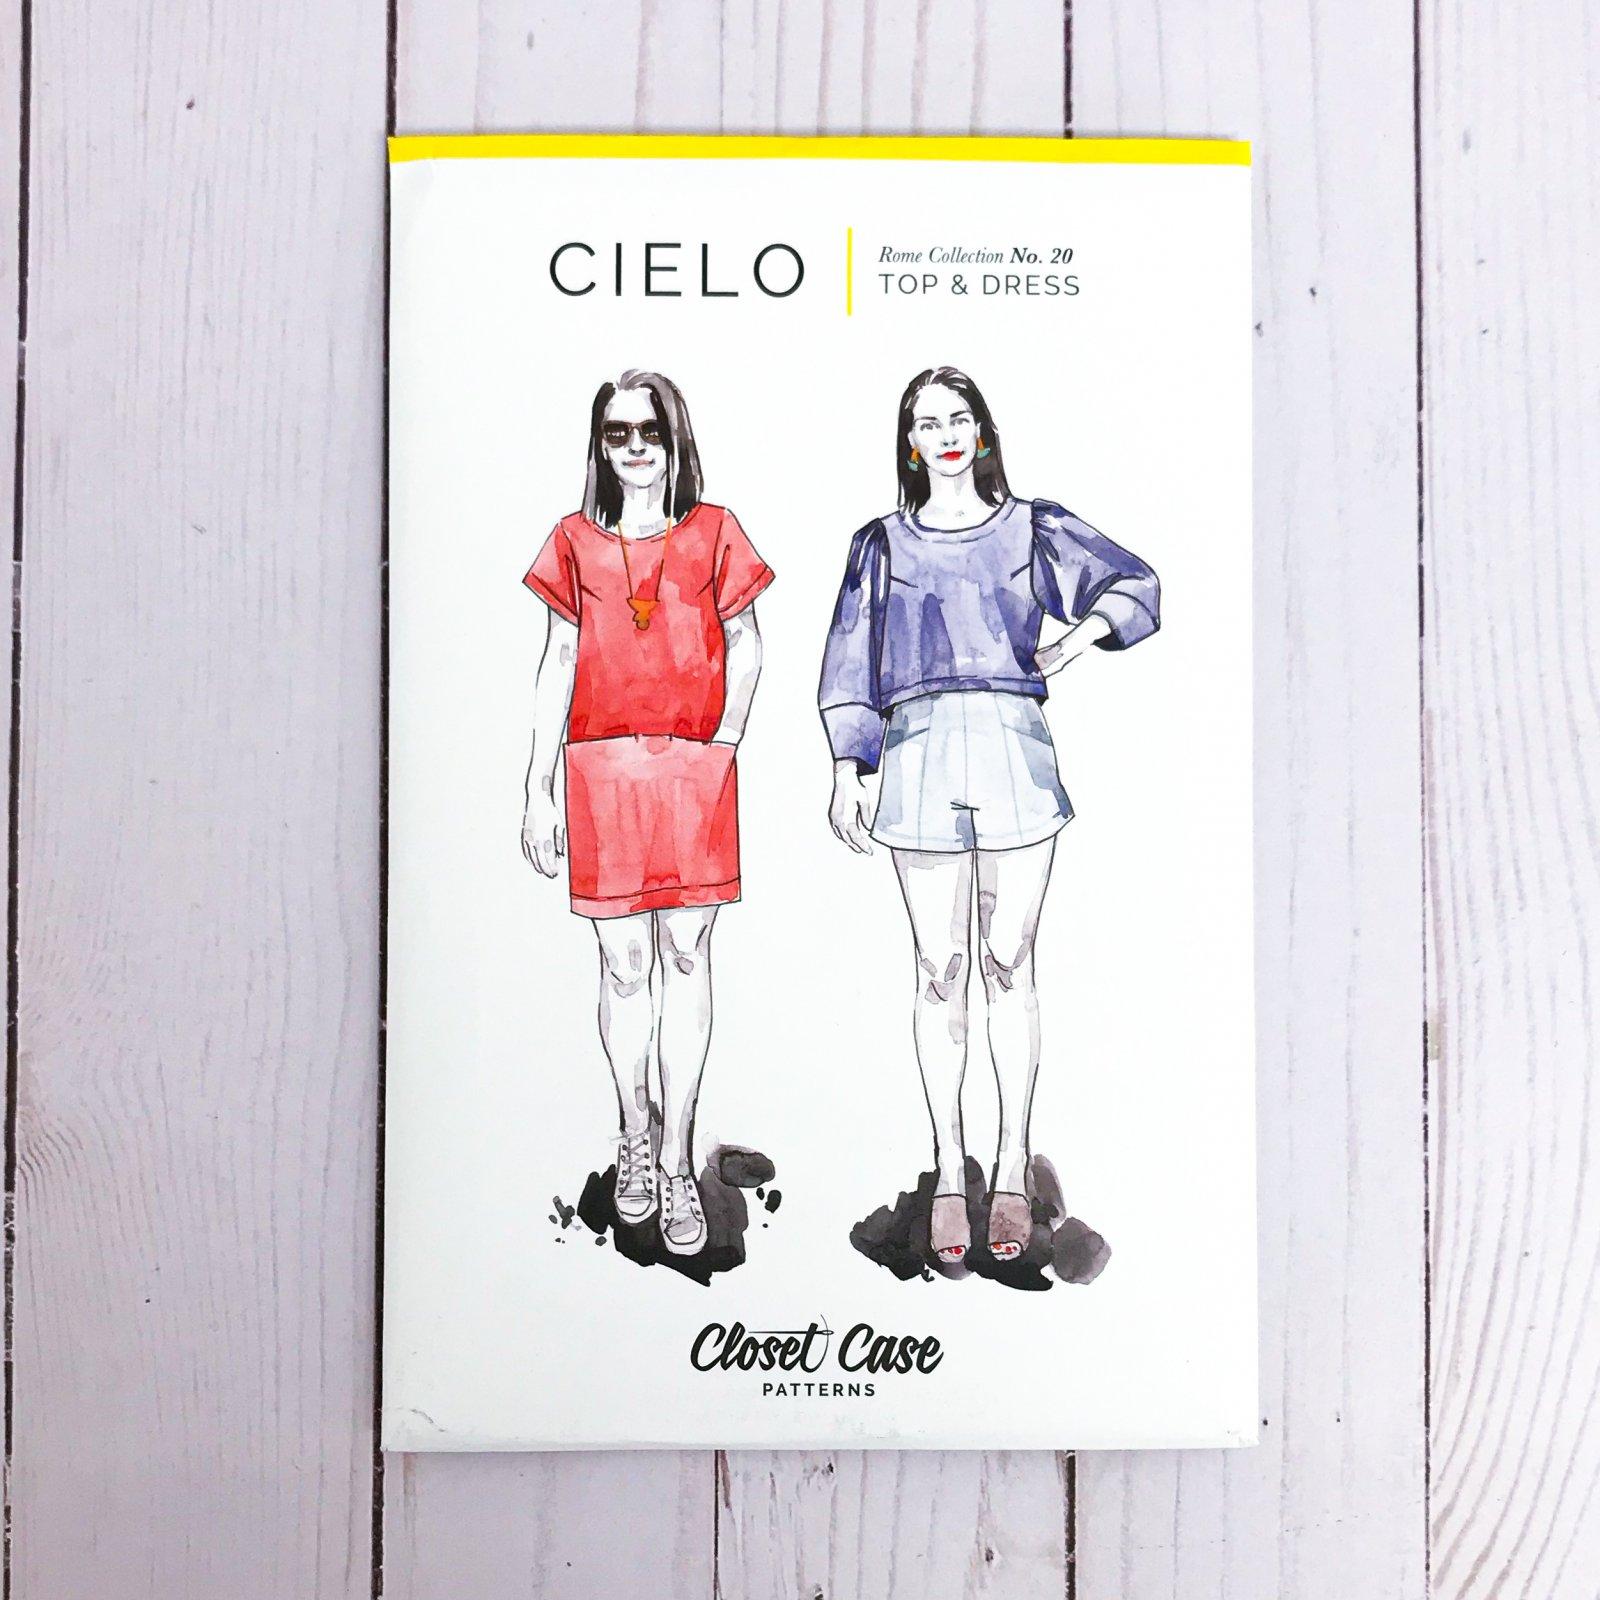 Closet Case Patterns - Cielo Top & Dress